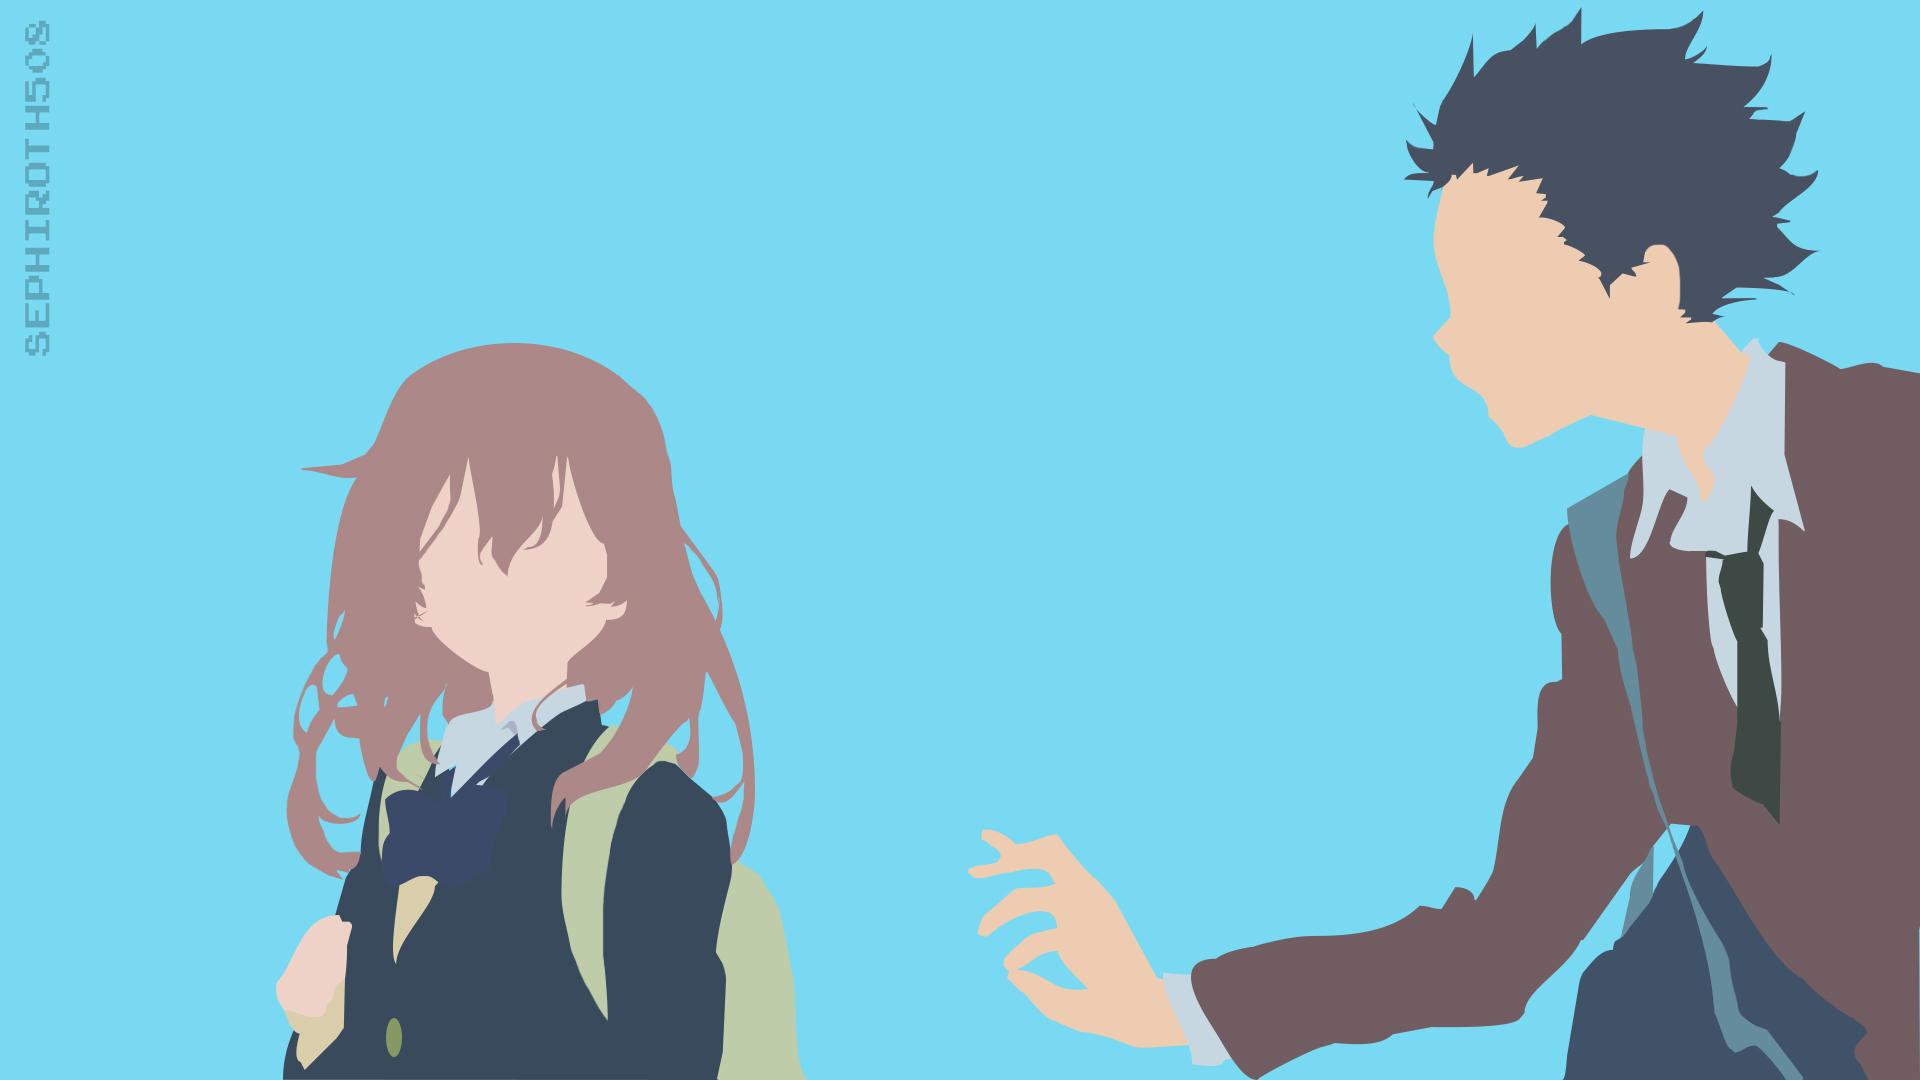 Koe No Katachi Hd Wallpaper Background Image 1920x1080 Id